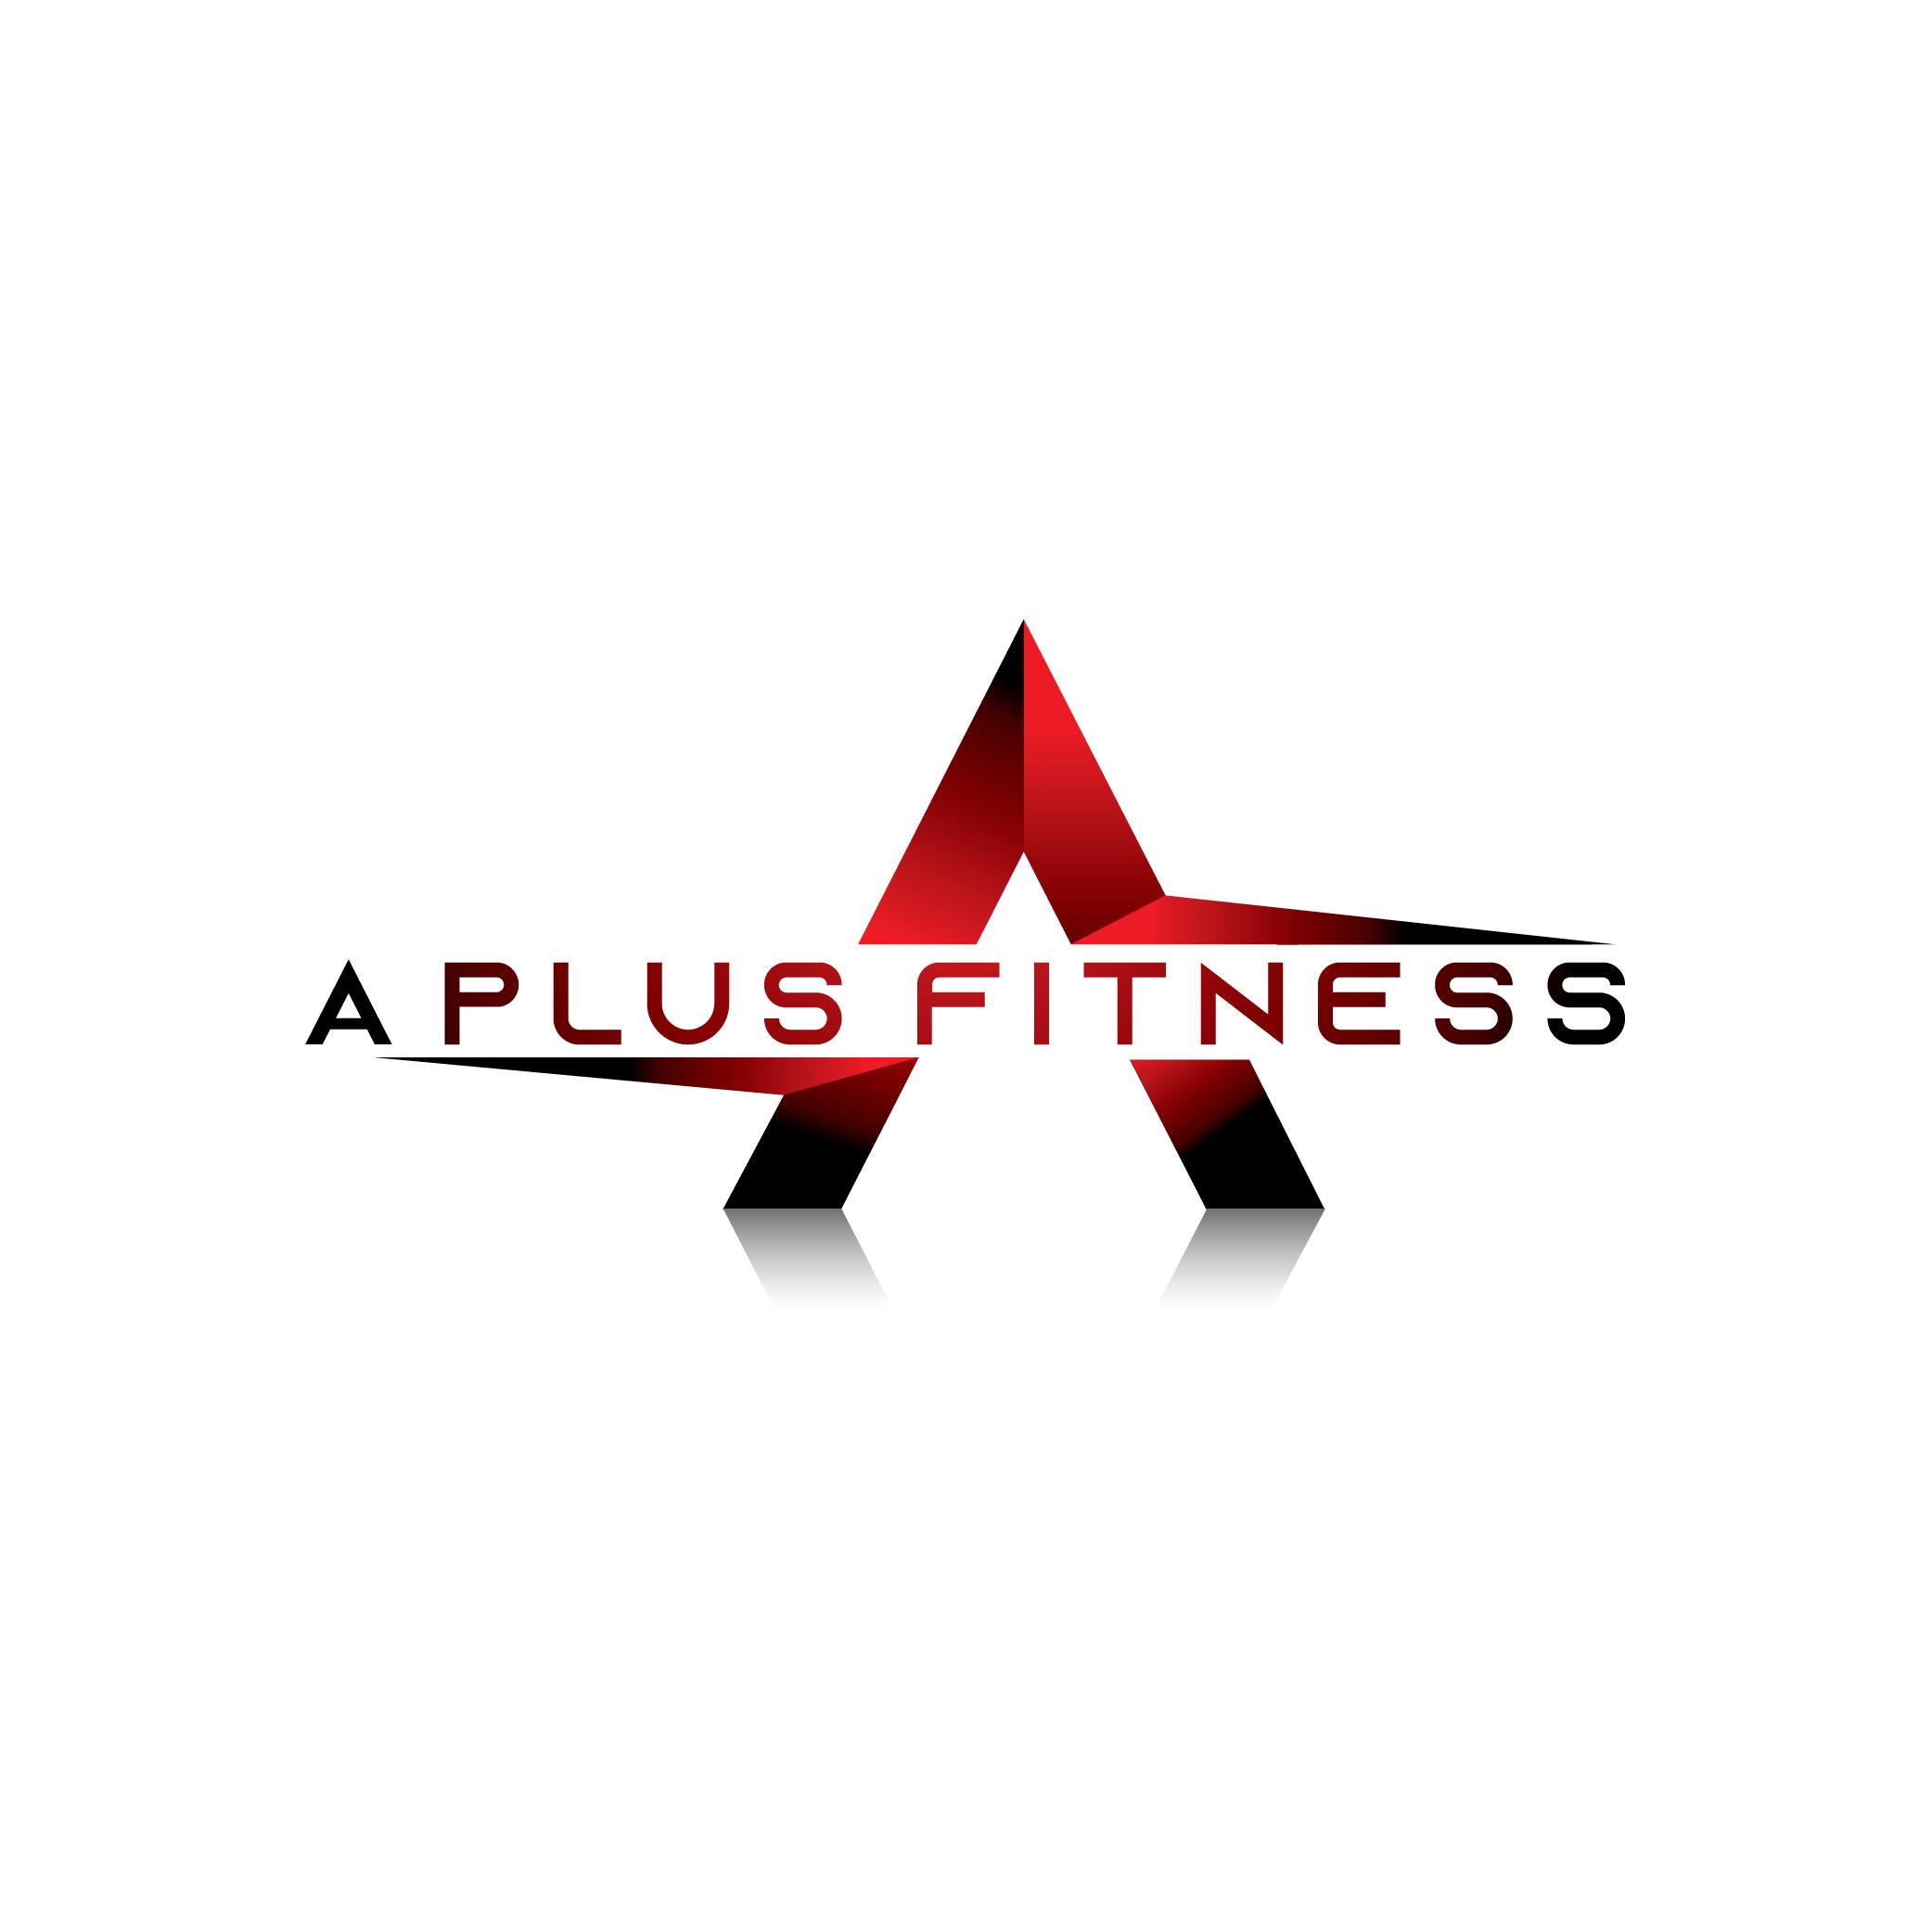 Design a logo and website for a Fitness & Wellness Start Up!